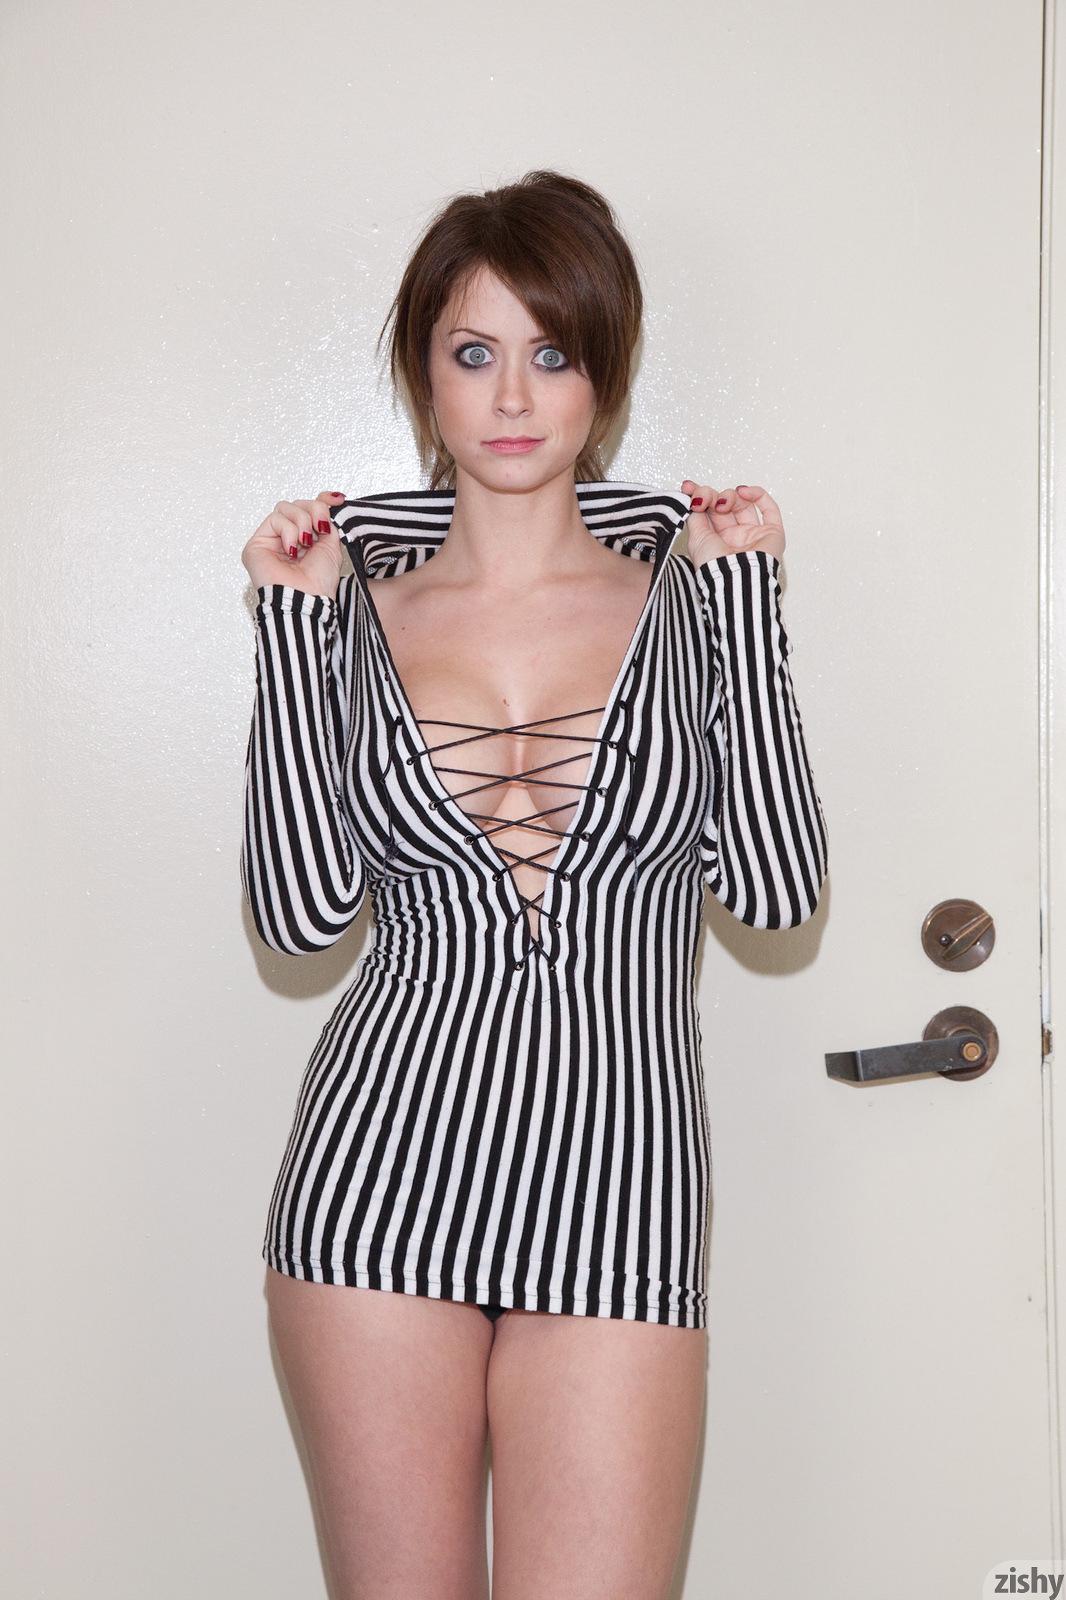 Emily Addison In Black And White Zishy (16)